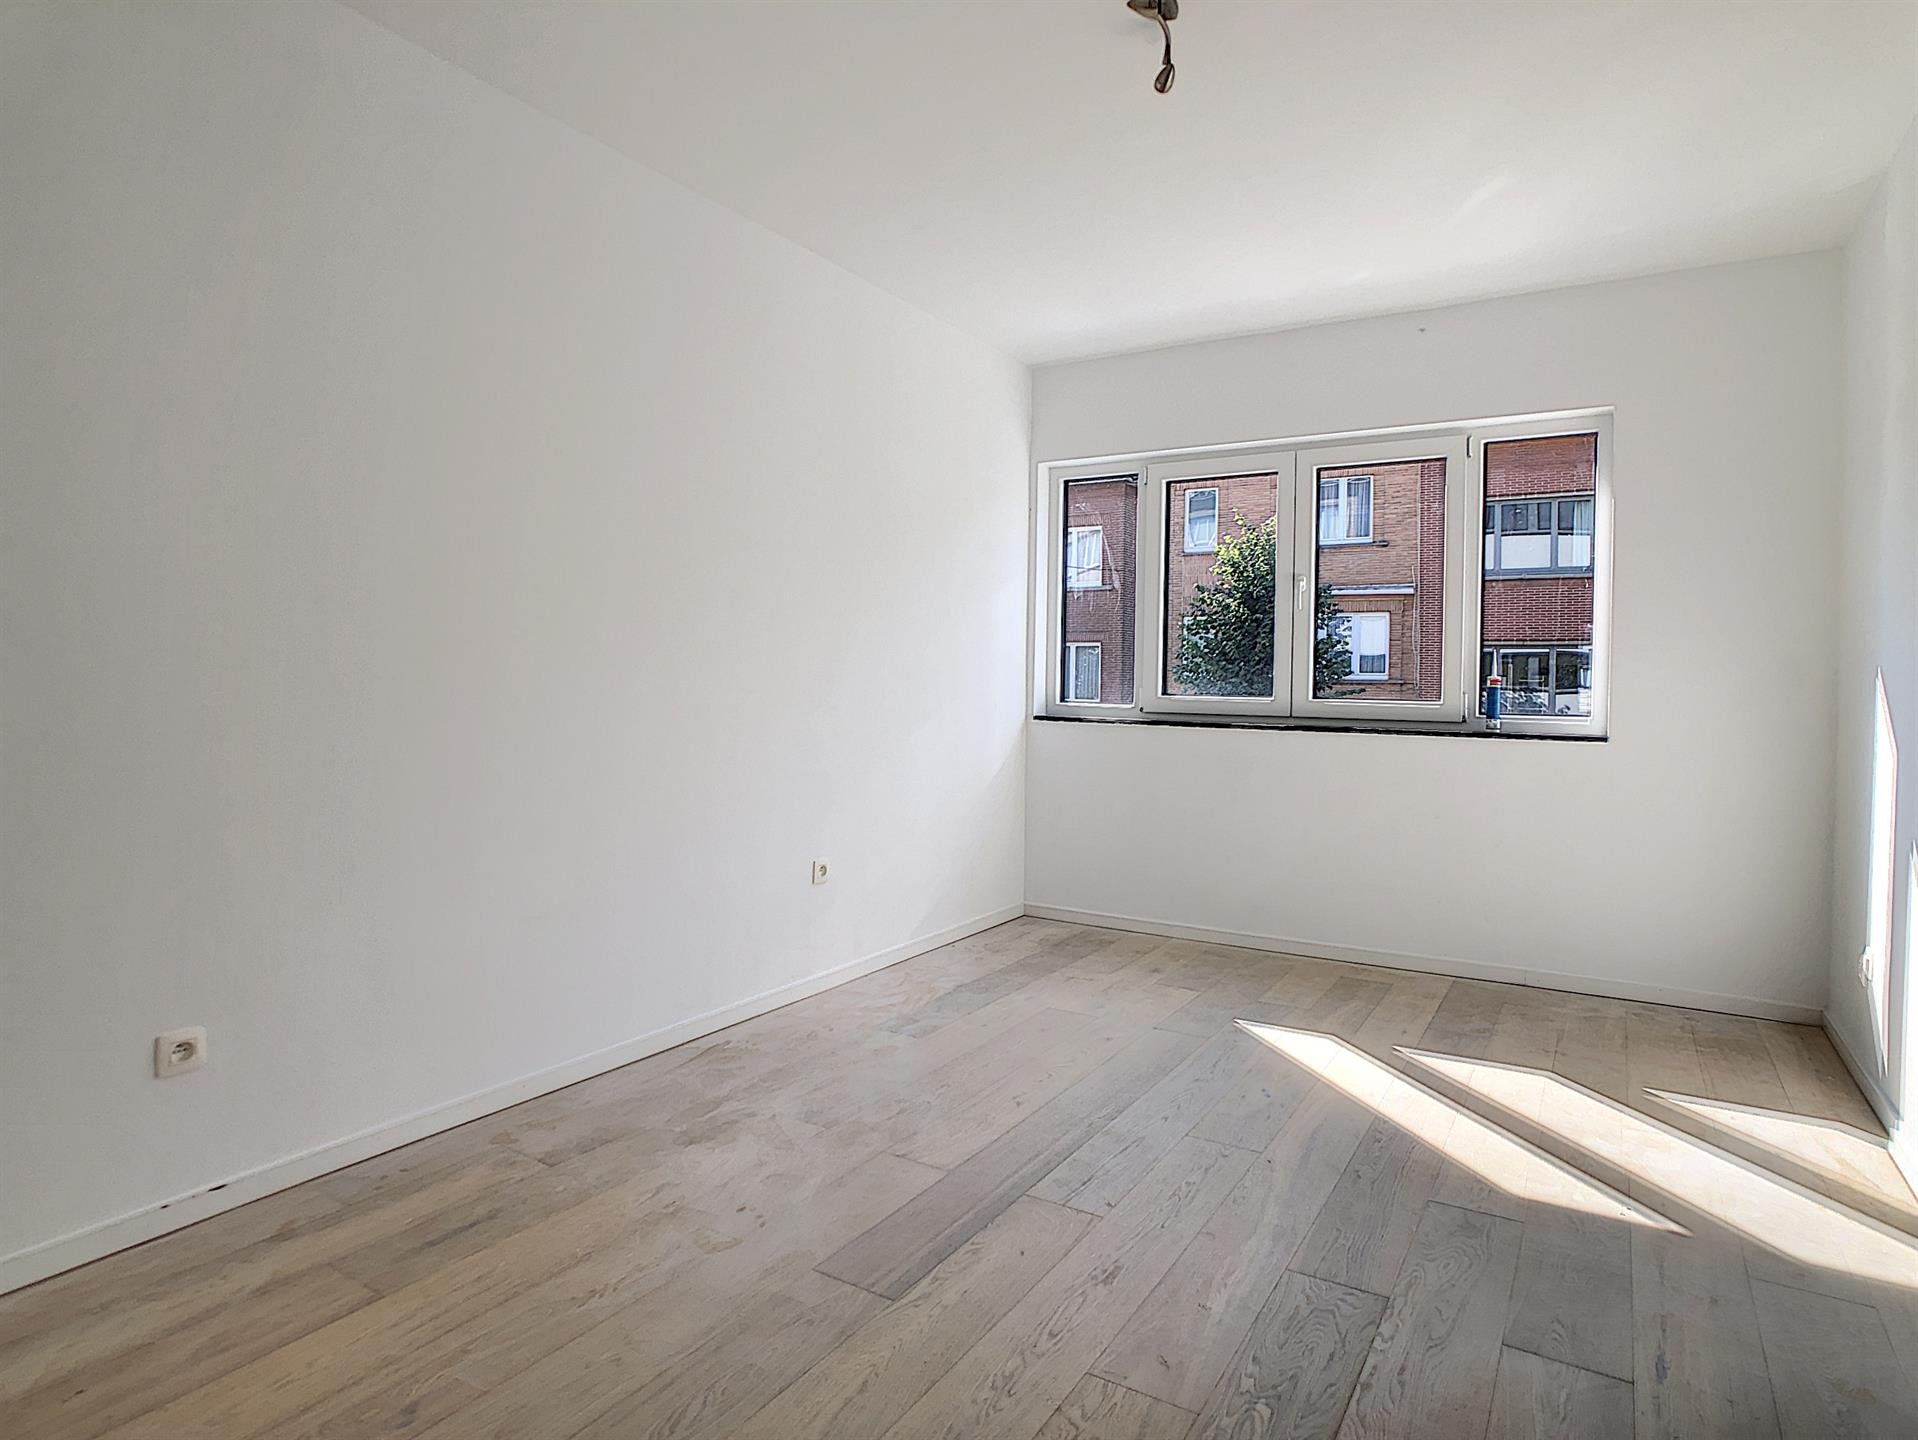 Appartement - Anderlecht - #4252376-8